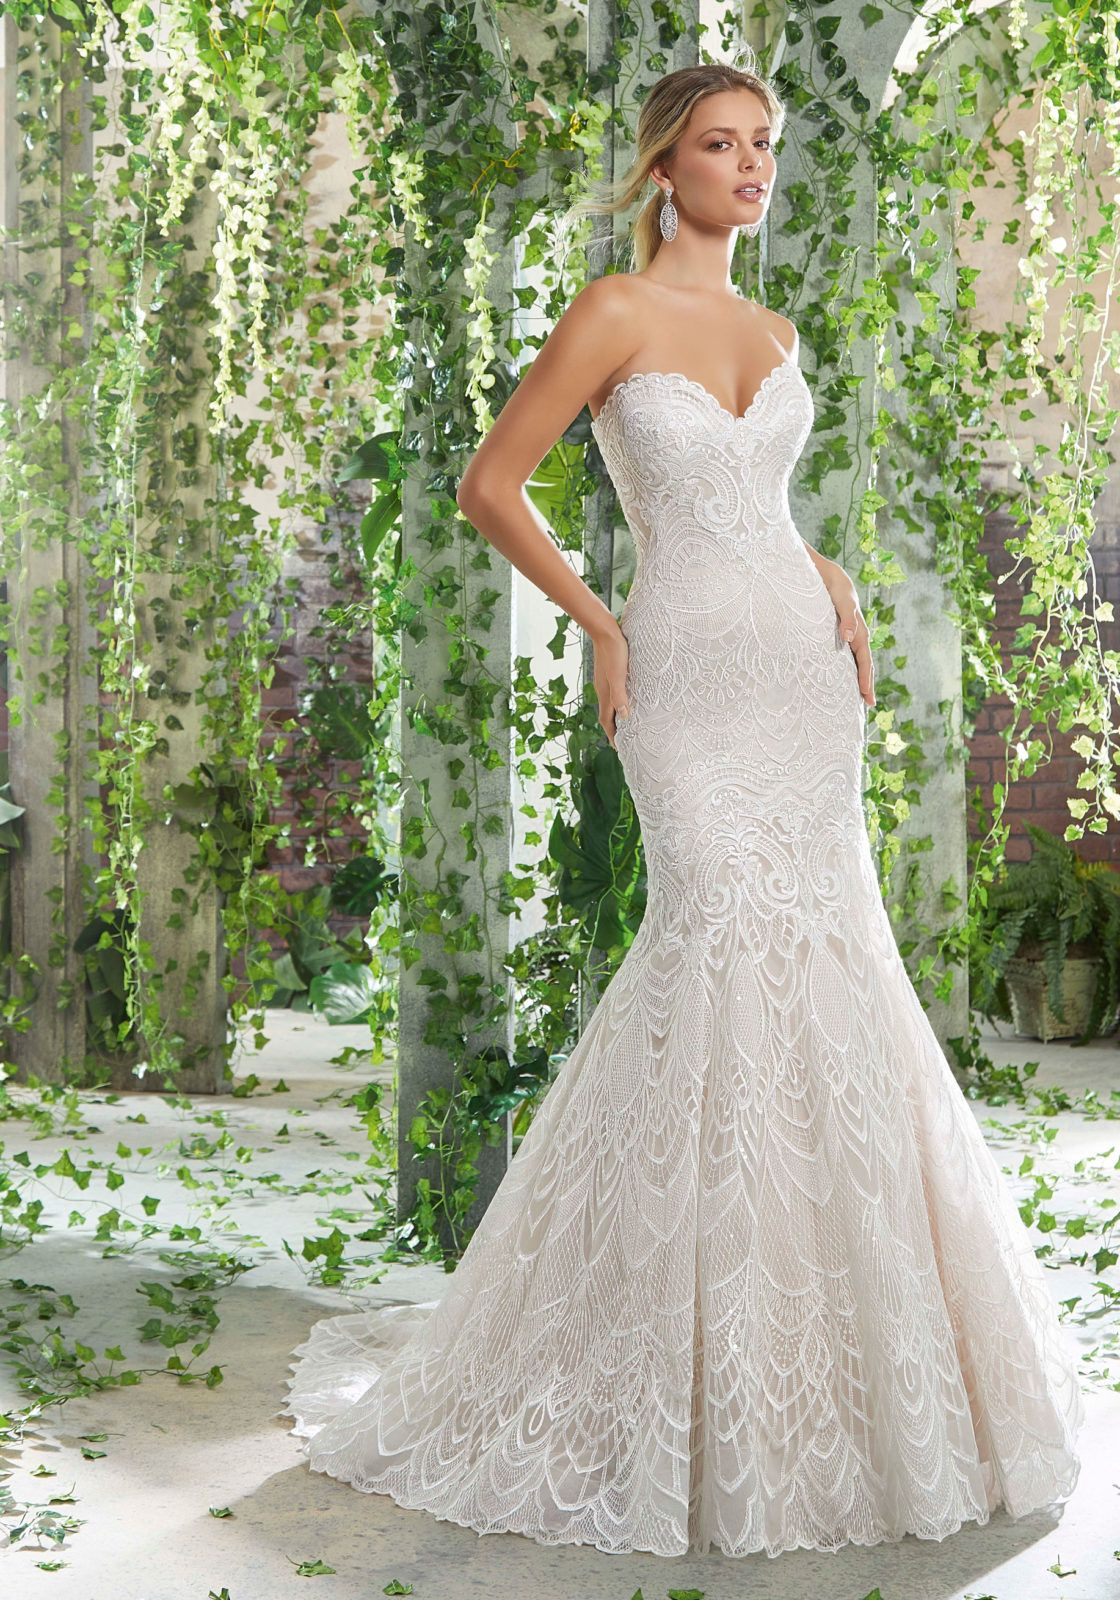 Pandora Wedding Dress Morilee Fitted Wedding Dress Wedding Dress Couture Fit And Flare Wedding Dress